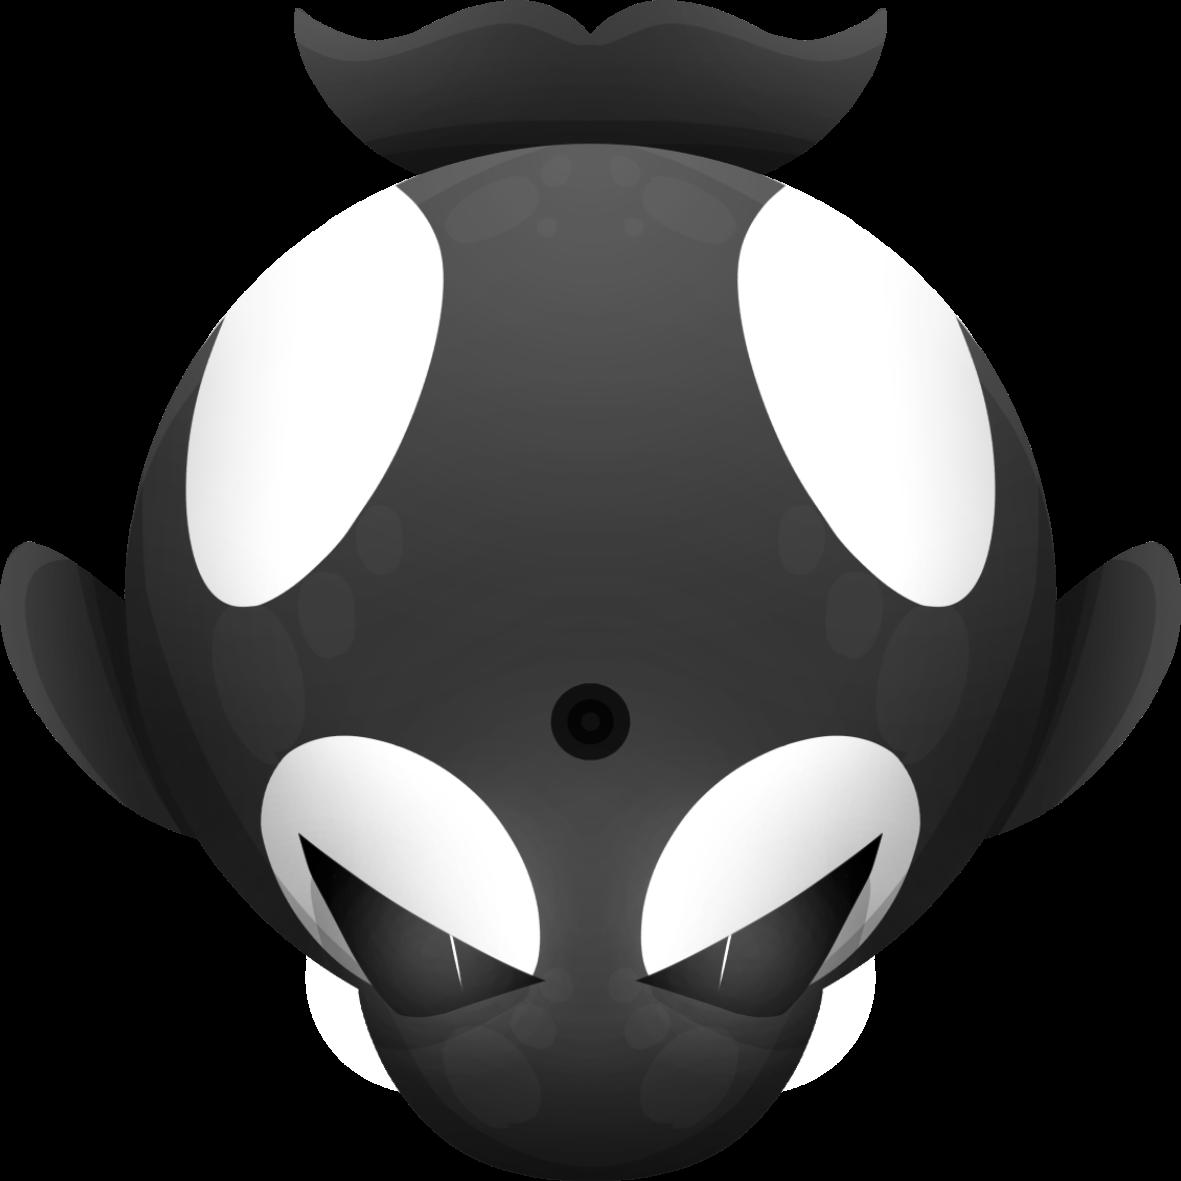 Orca clipart animation. Hd my dudes mopeio